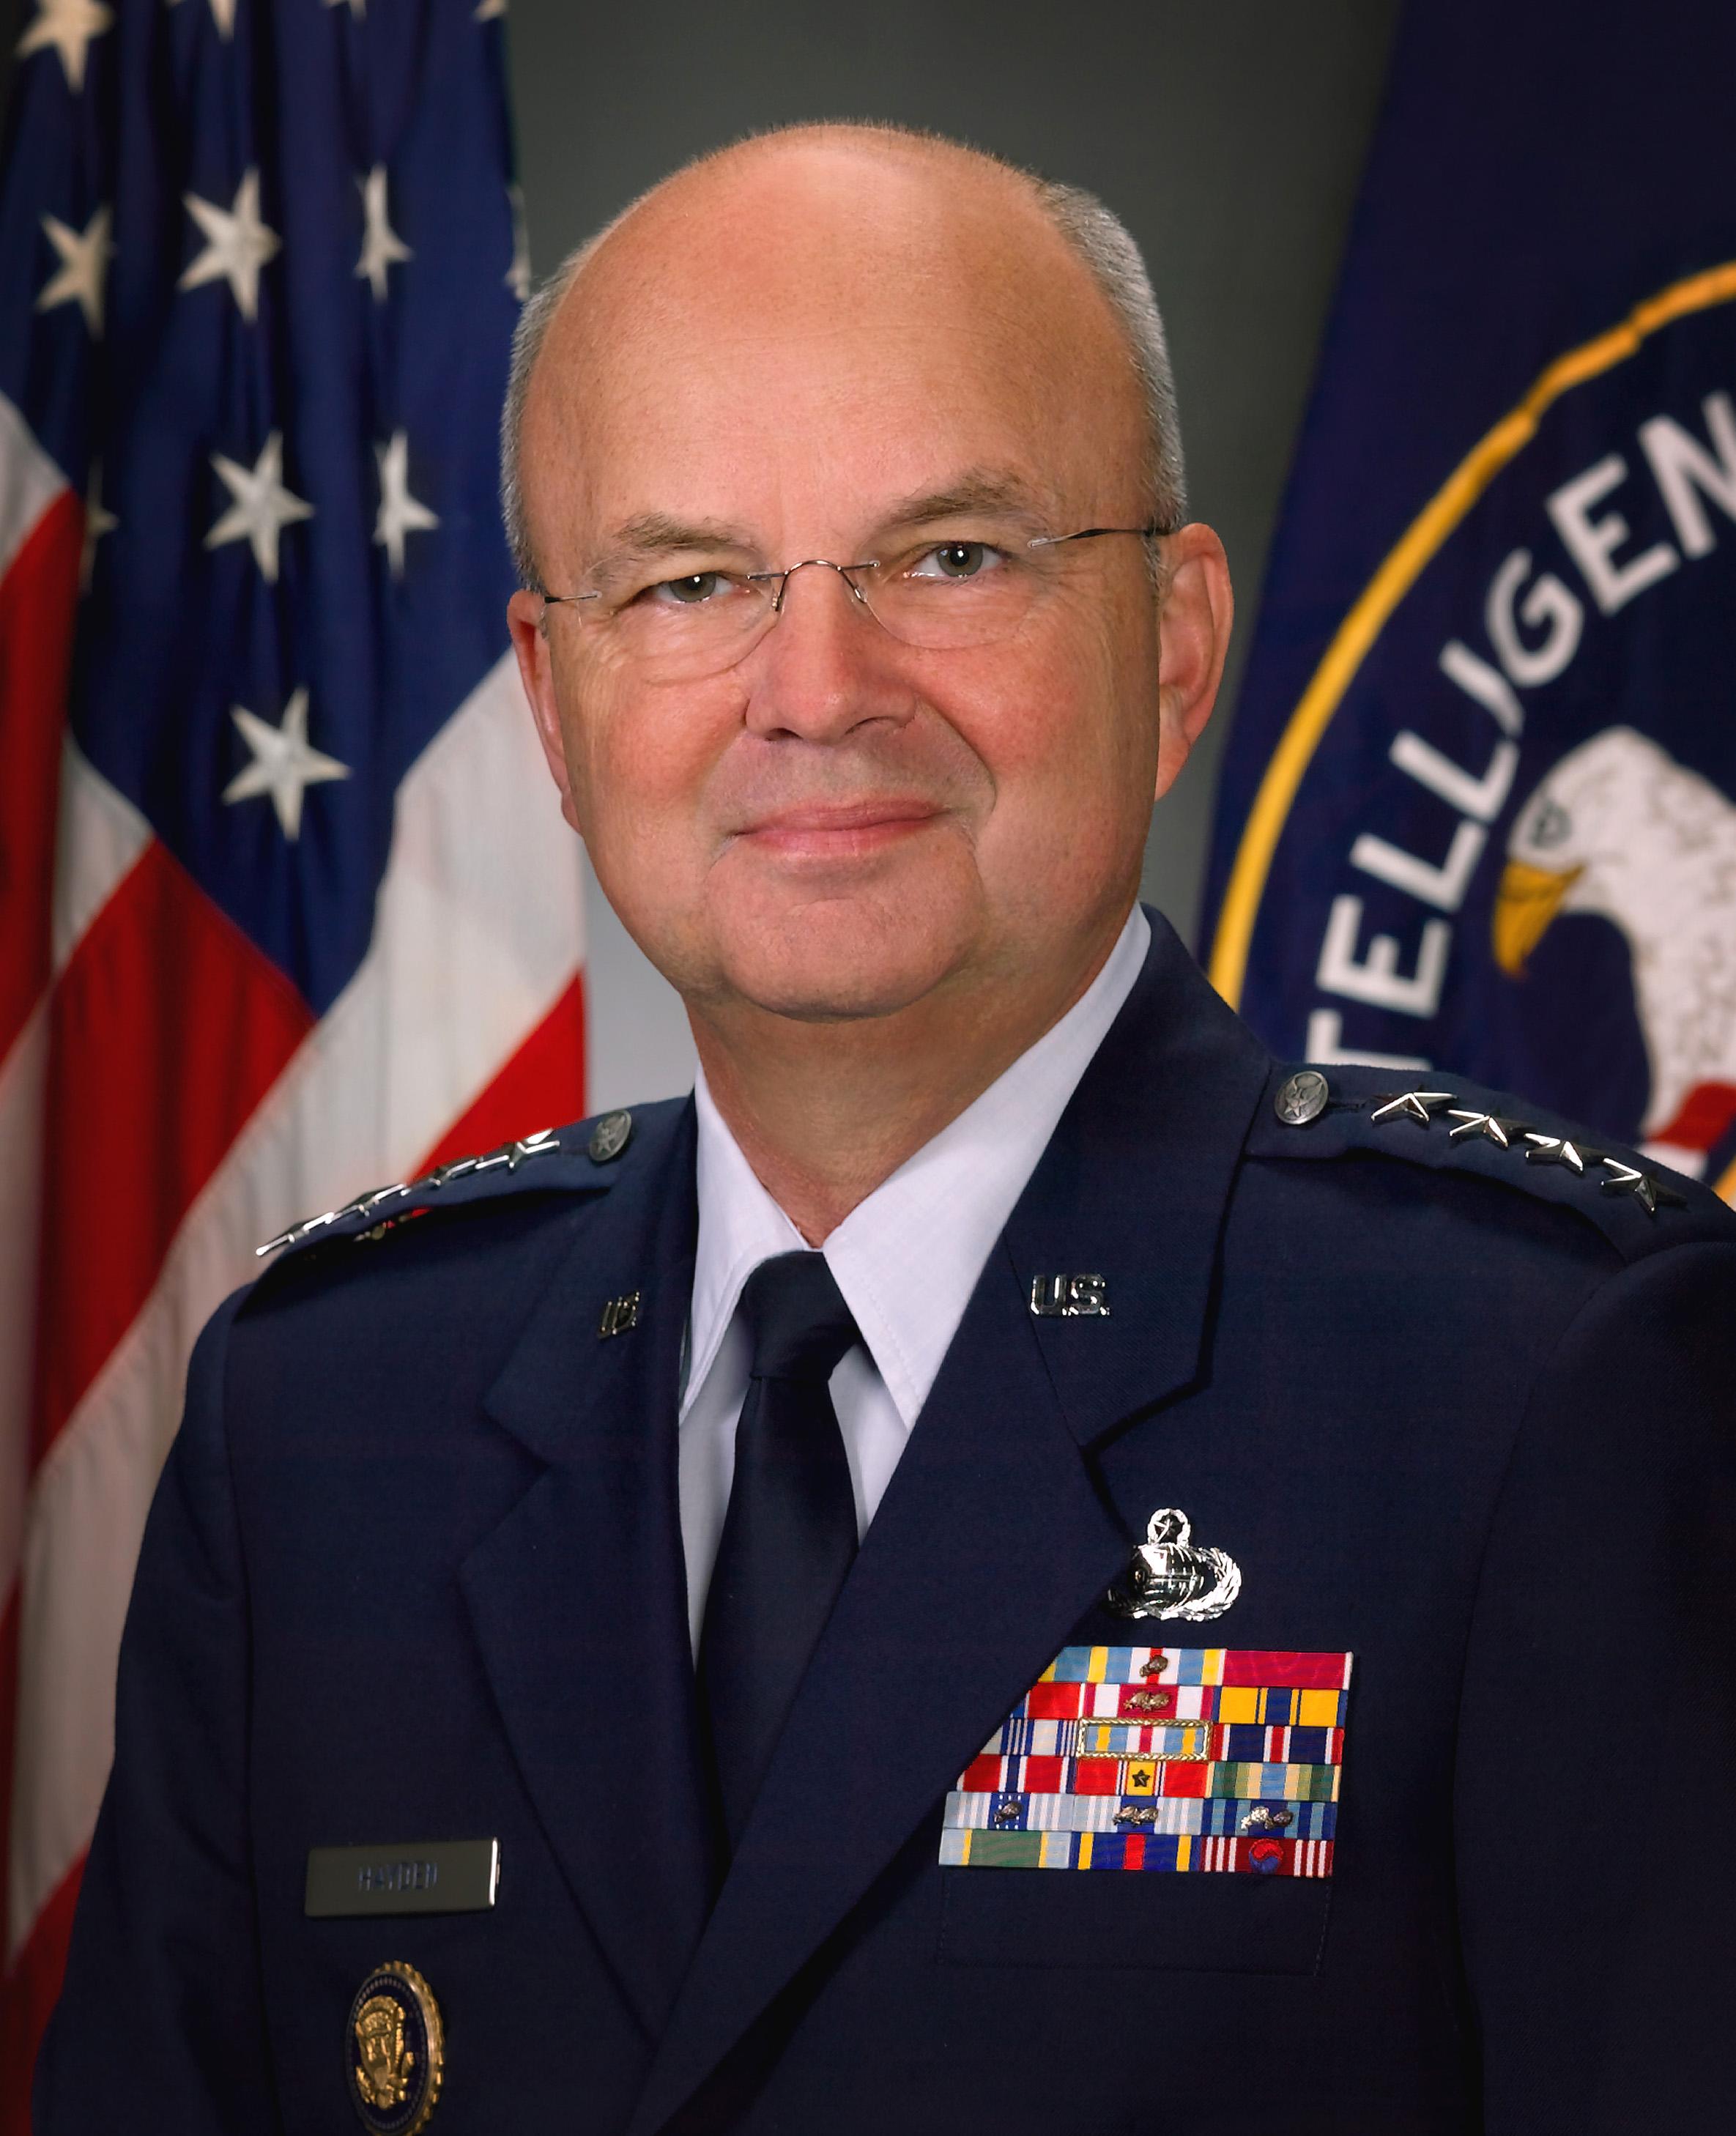 Who Should We Fear in Cyber Espionage? General Michael Hayden